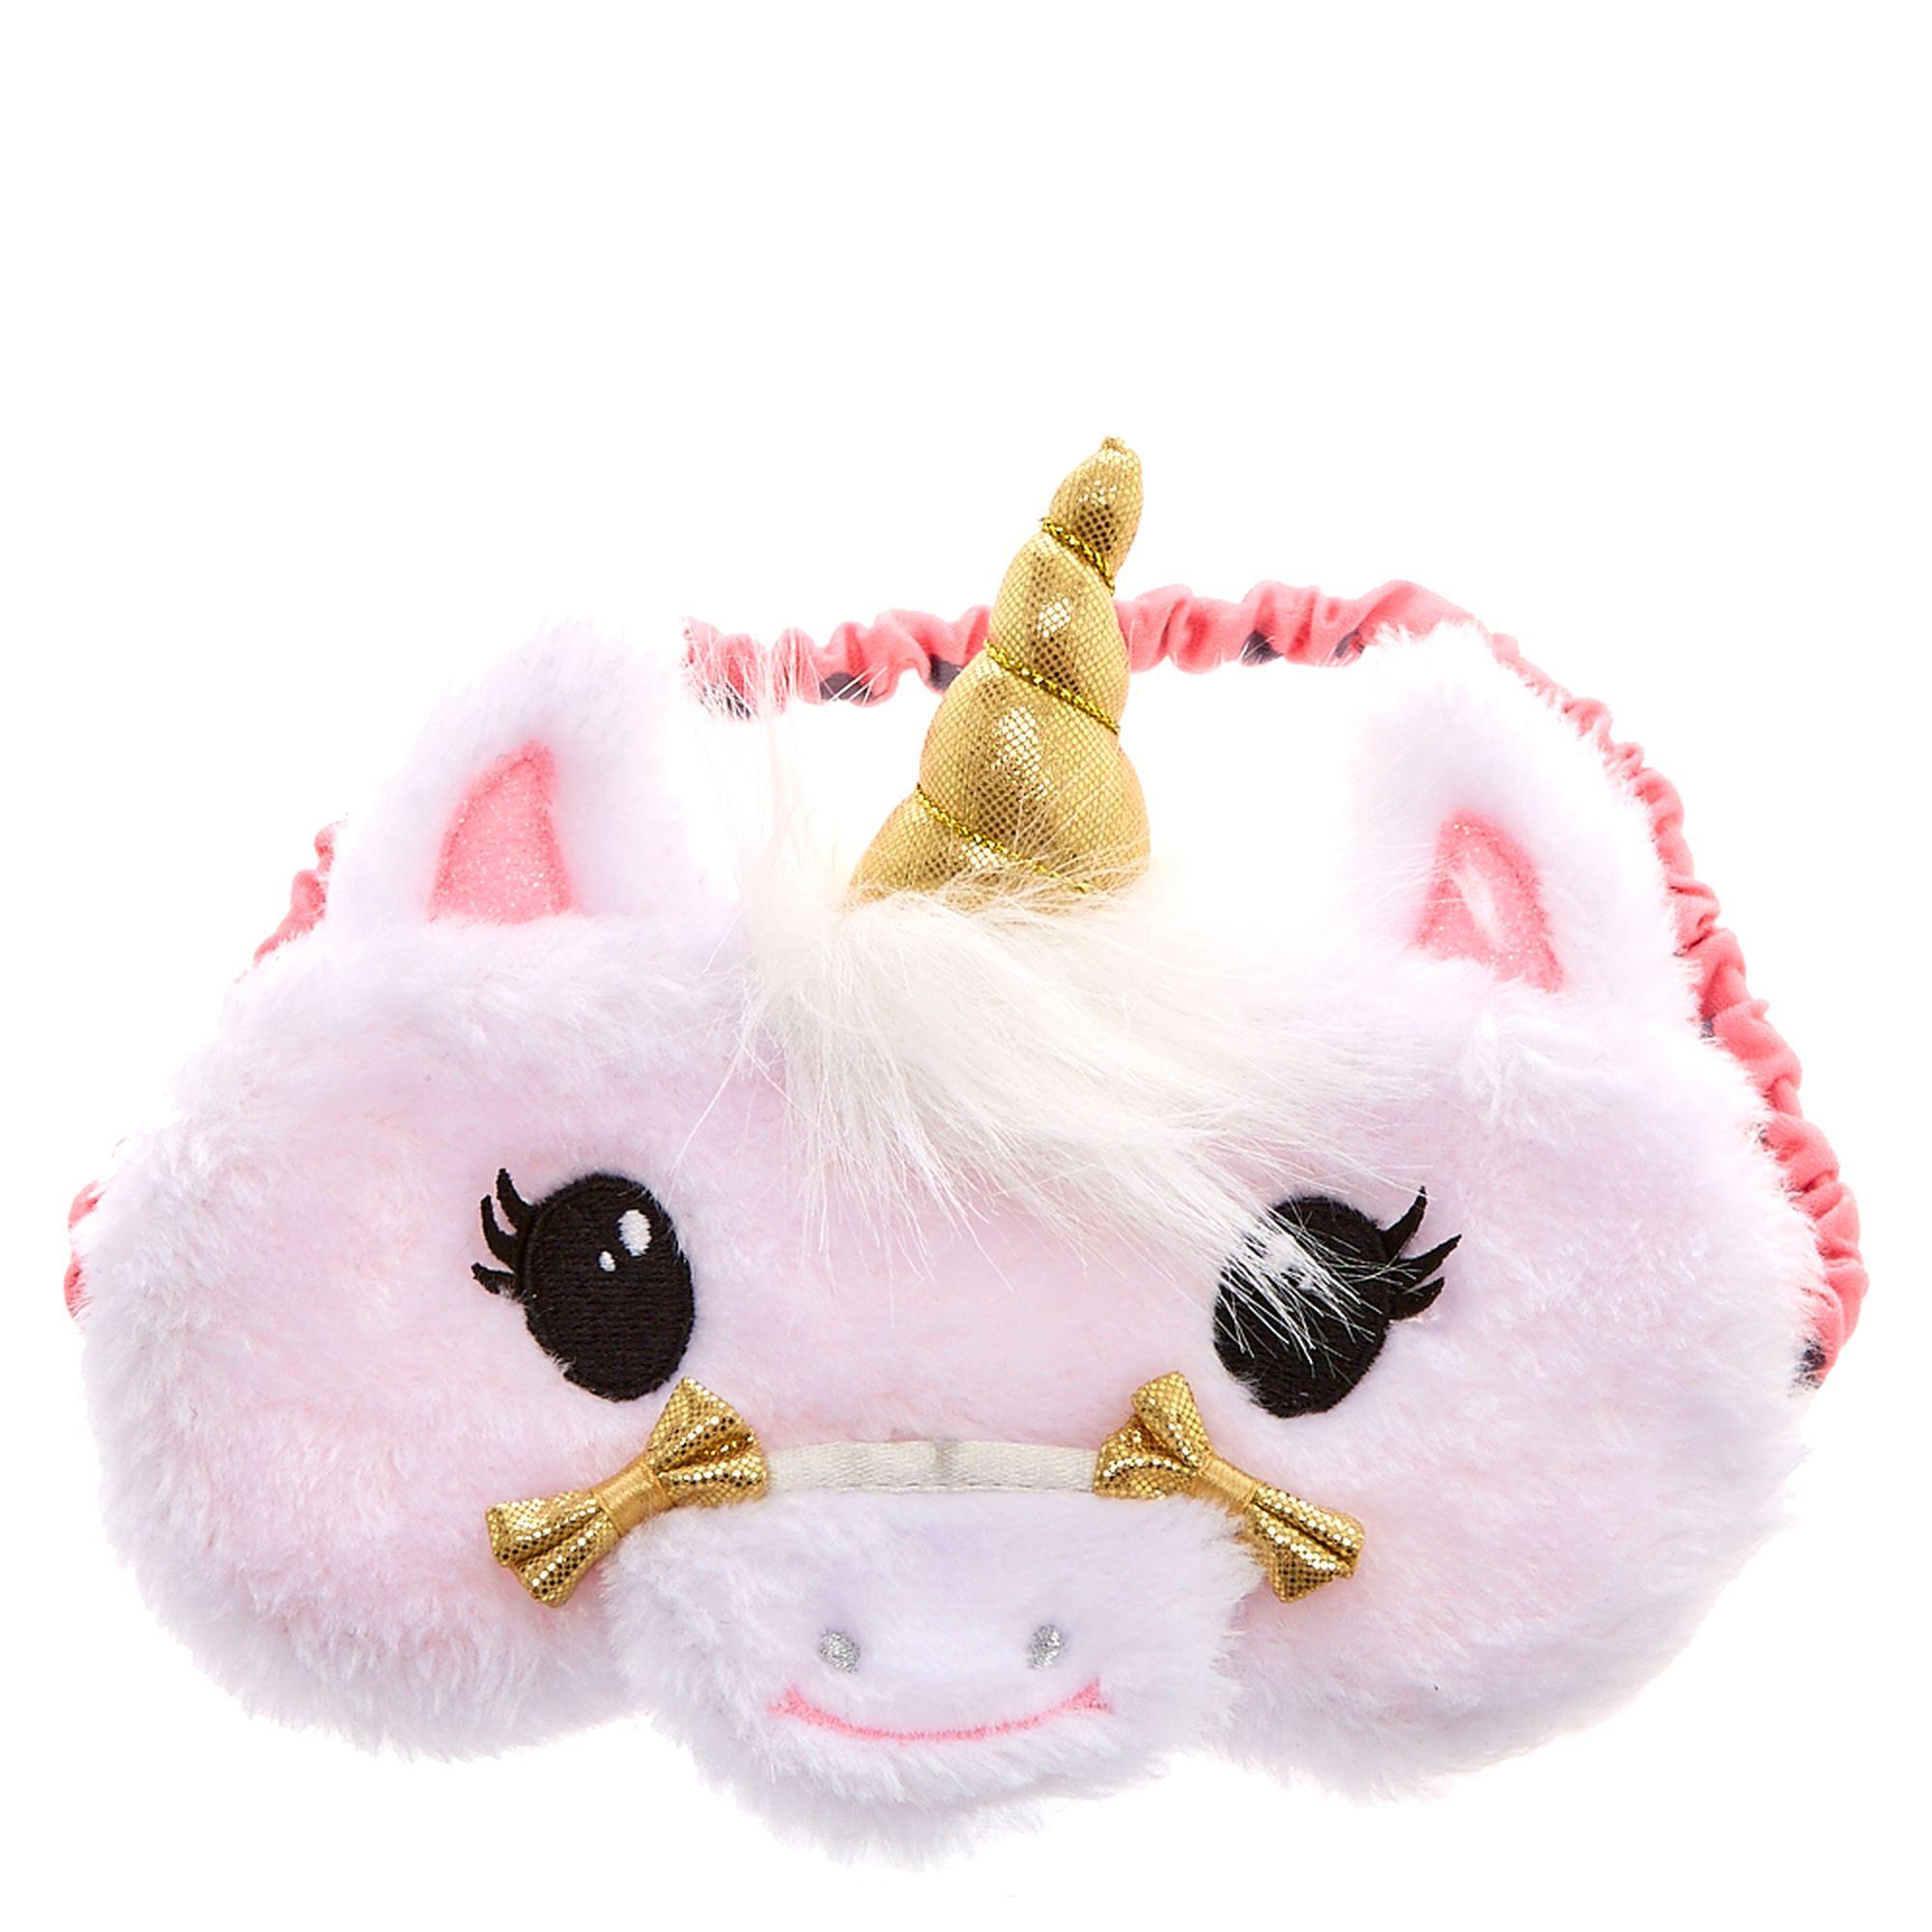 d7a725c5b48 Claire s Club Plush Unicorn Sleeping Mask